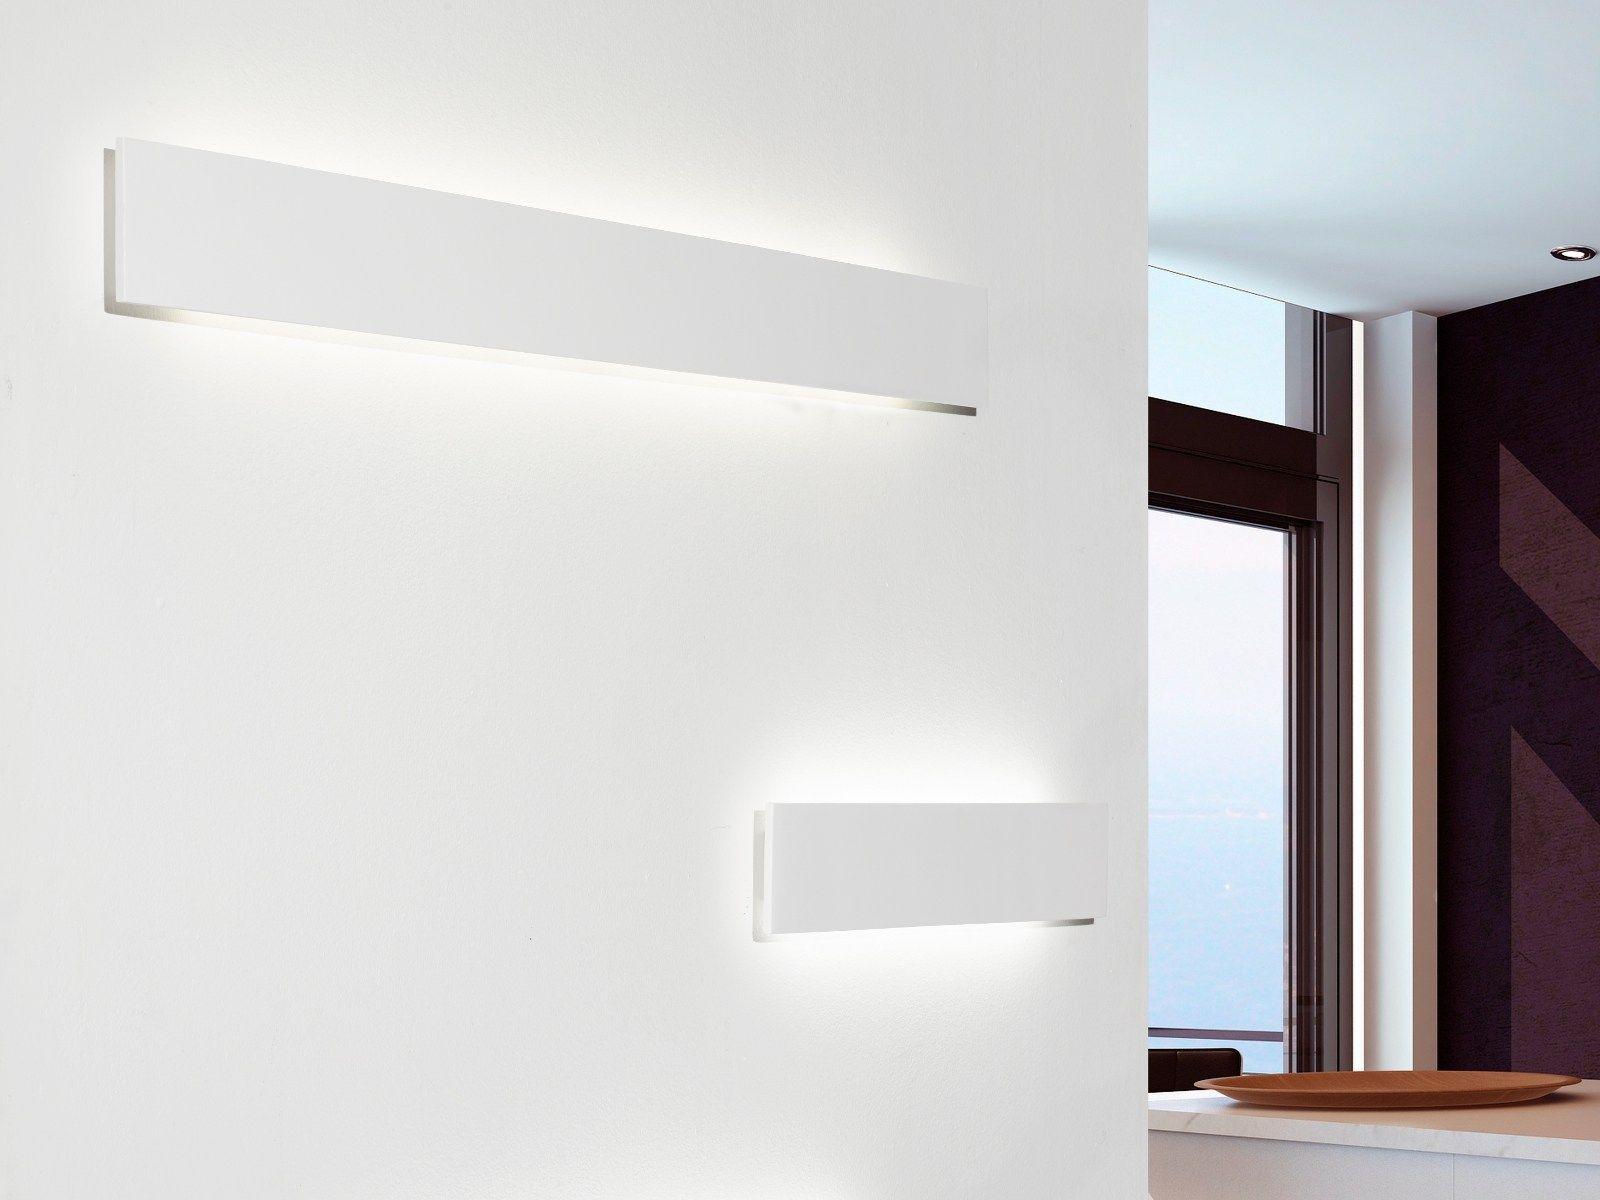 Lampada da parete a LED a luce indiretta in gesso MILOS by Sforzin Illuminazione design Marco Spatti